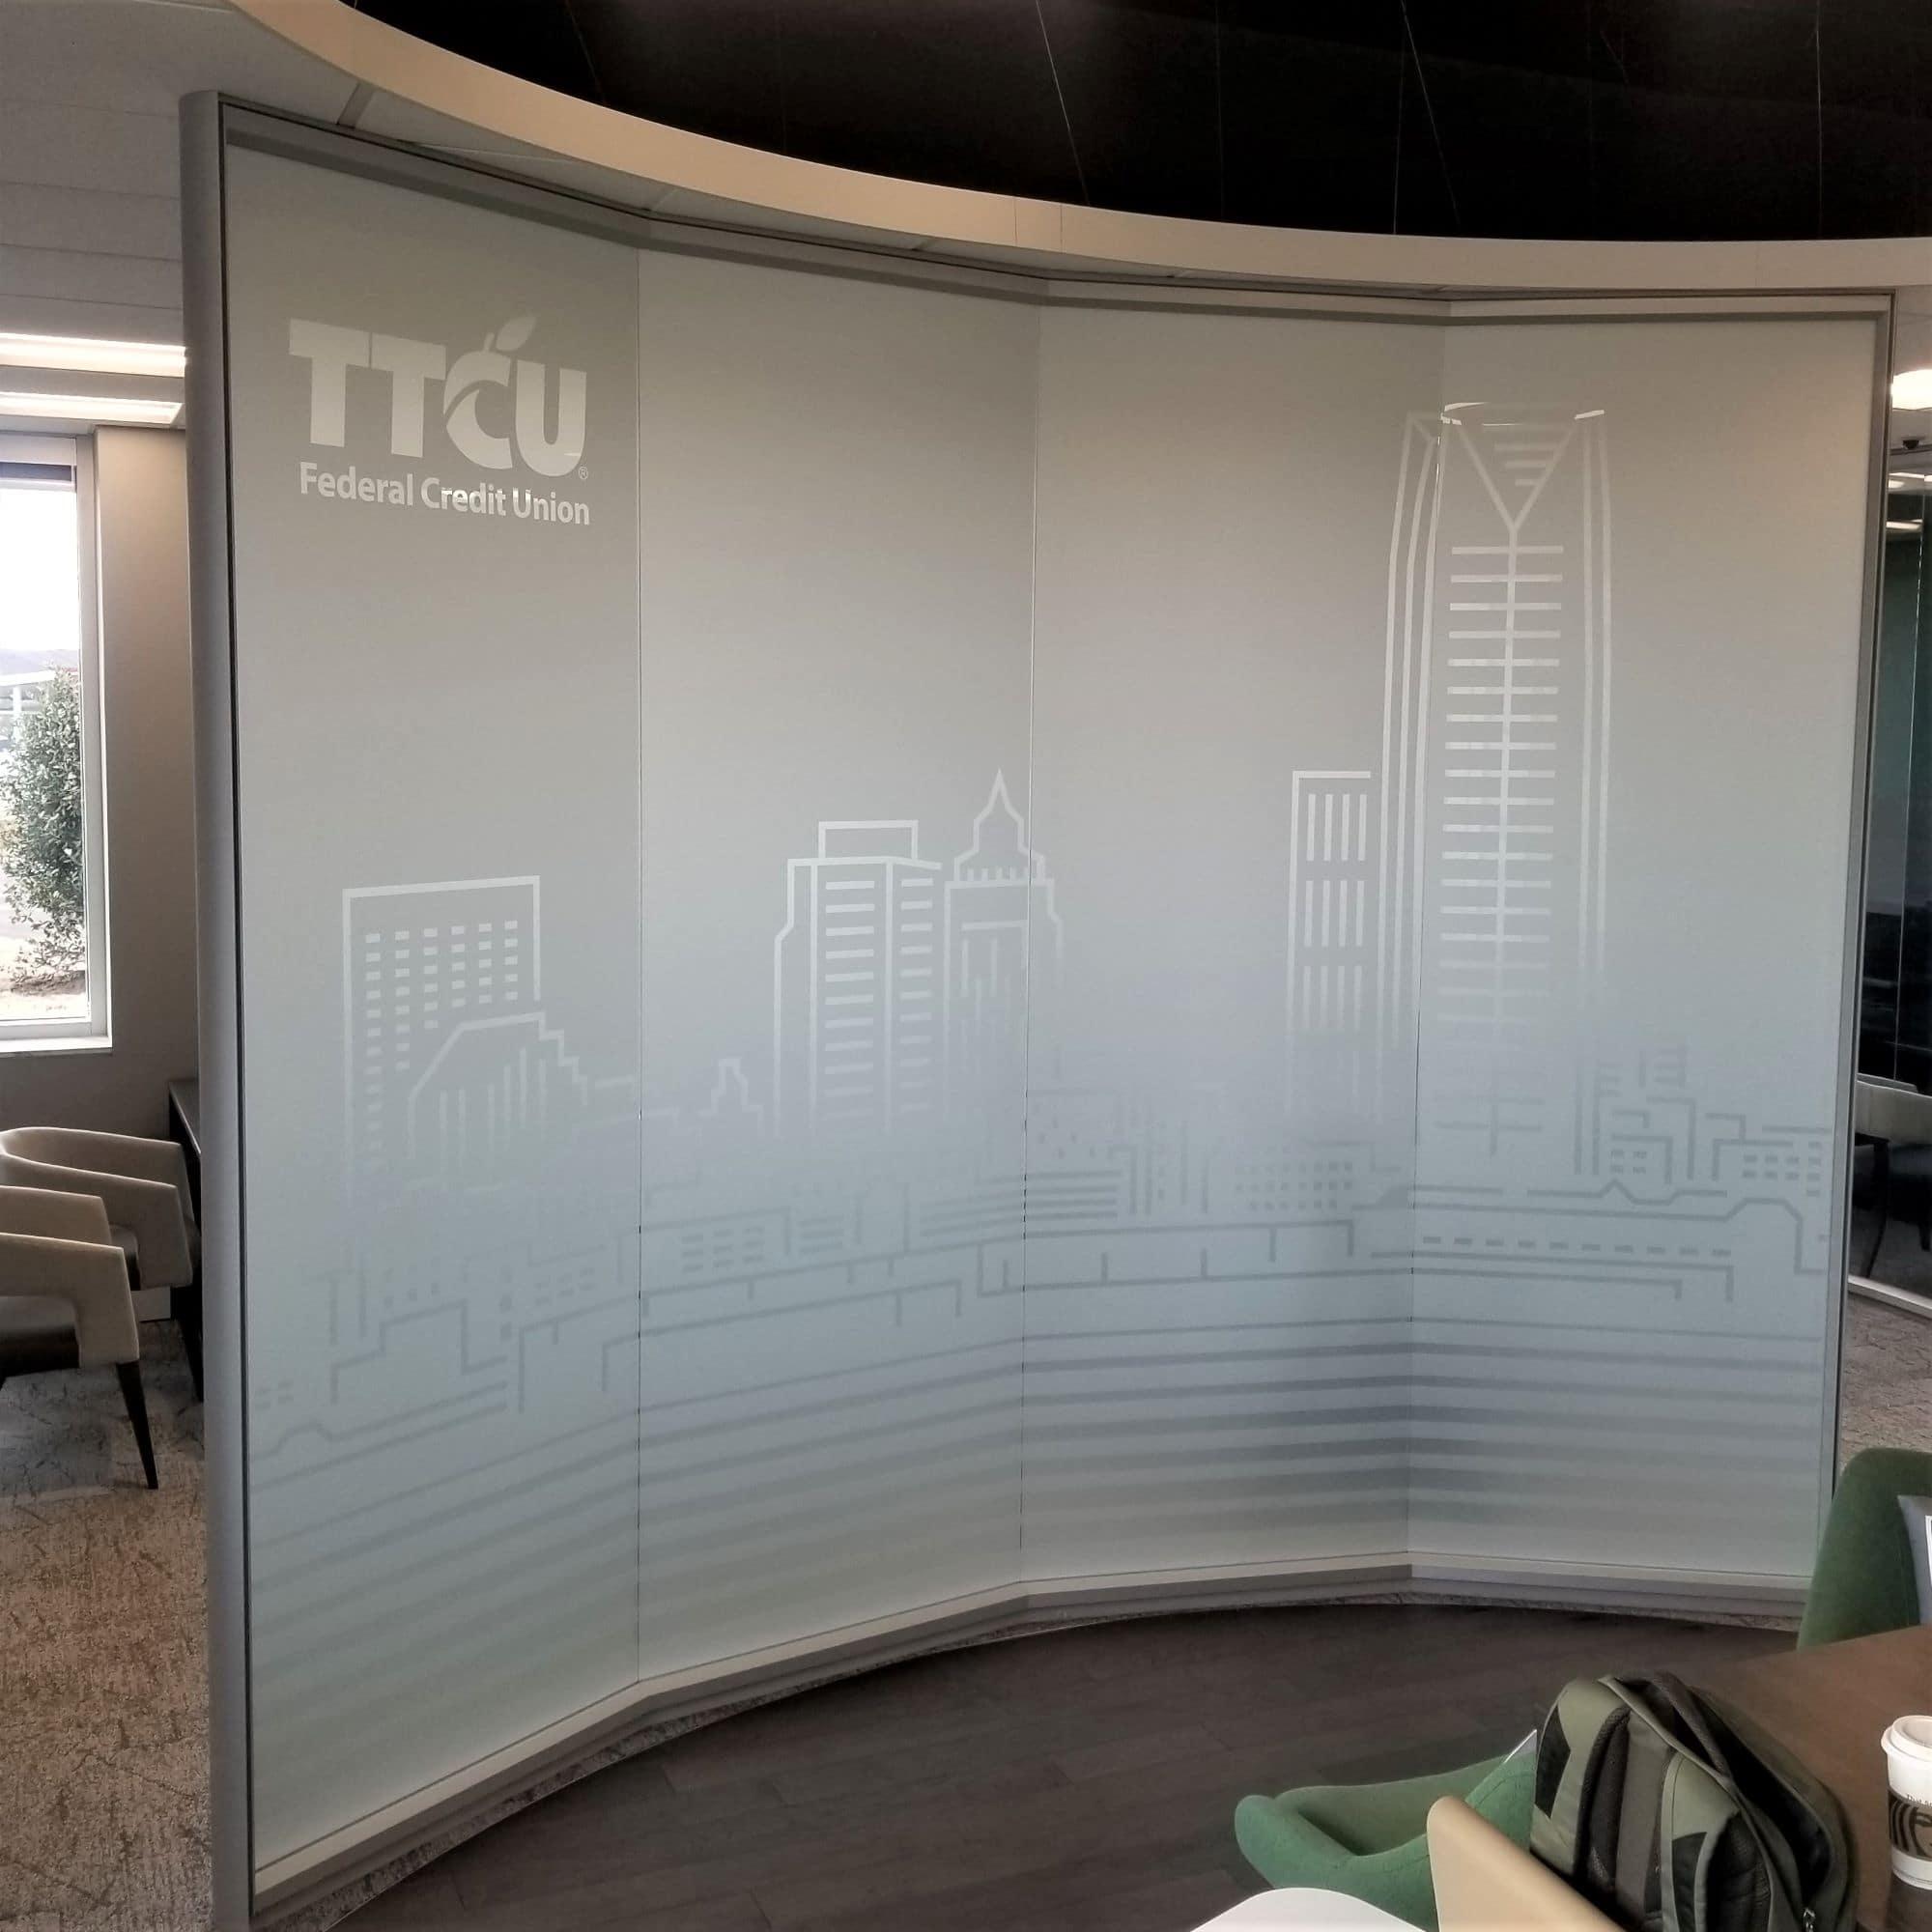 TTCU privacy window vinyl